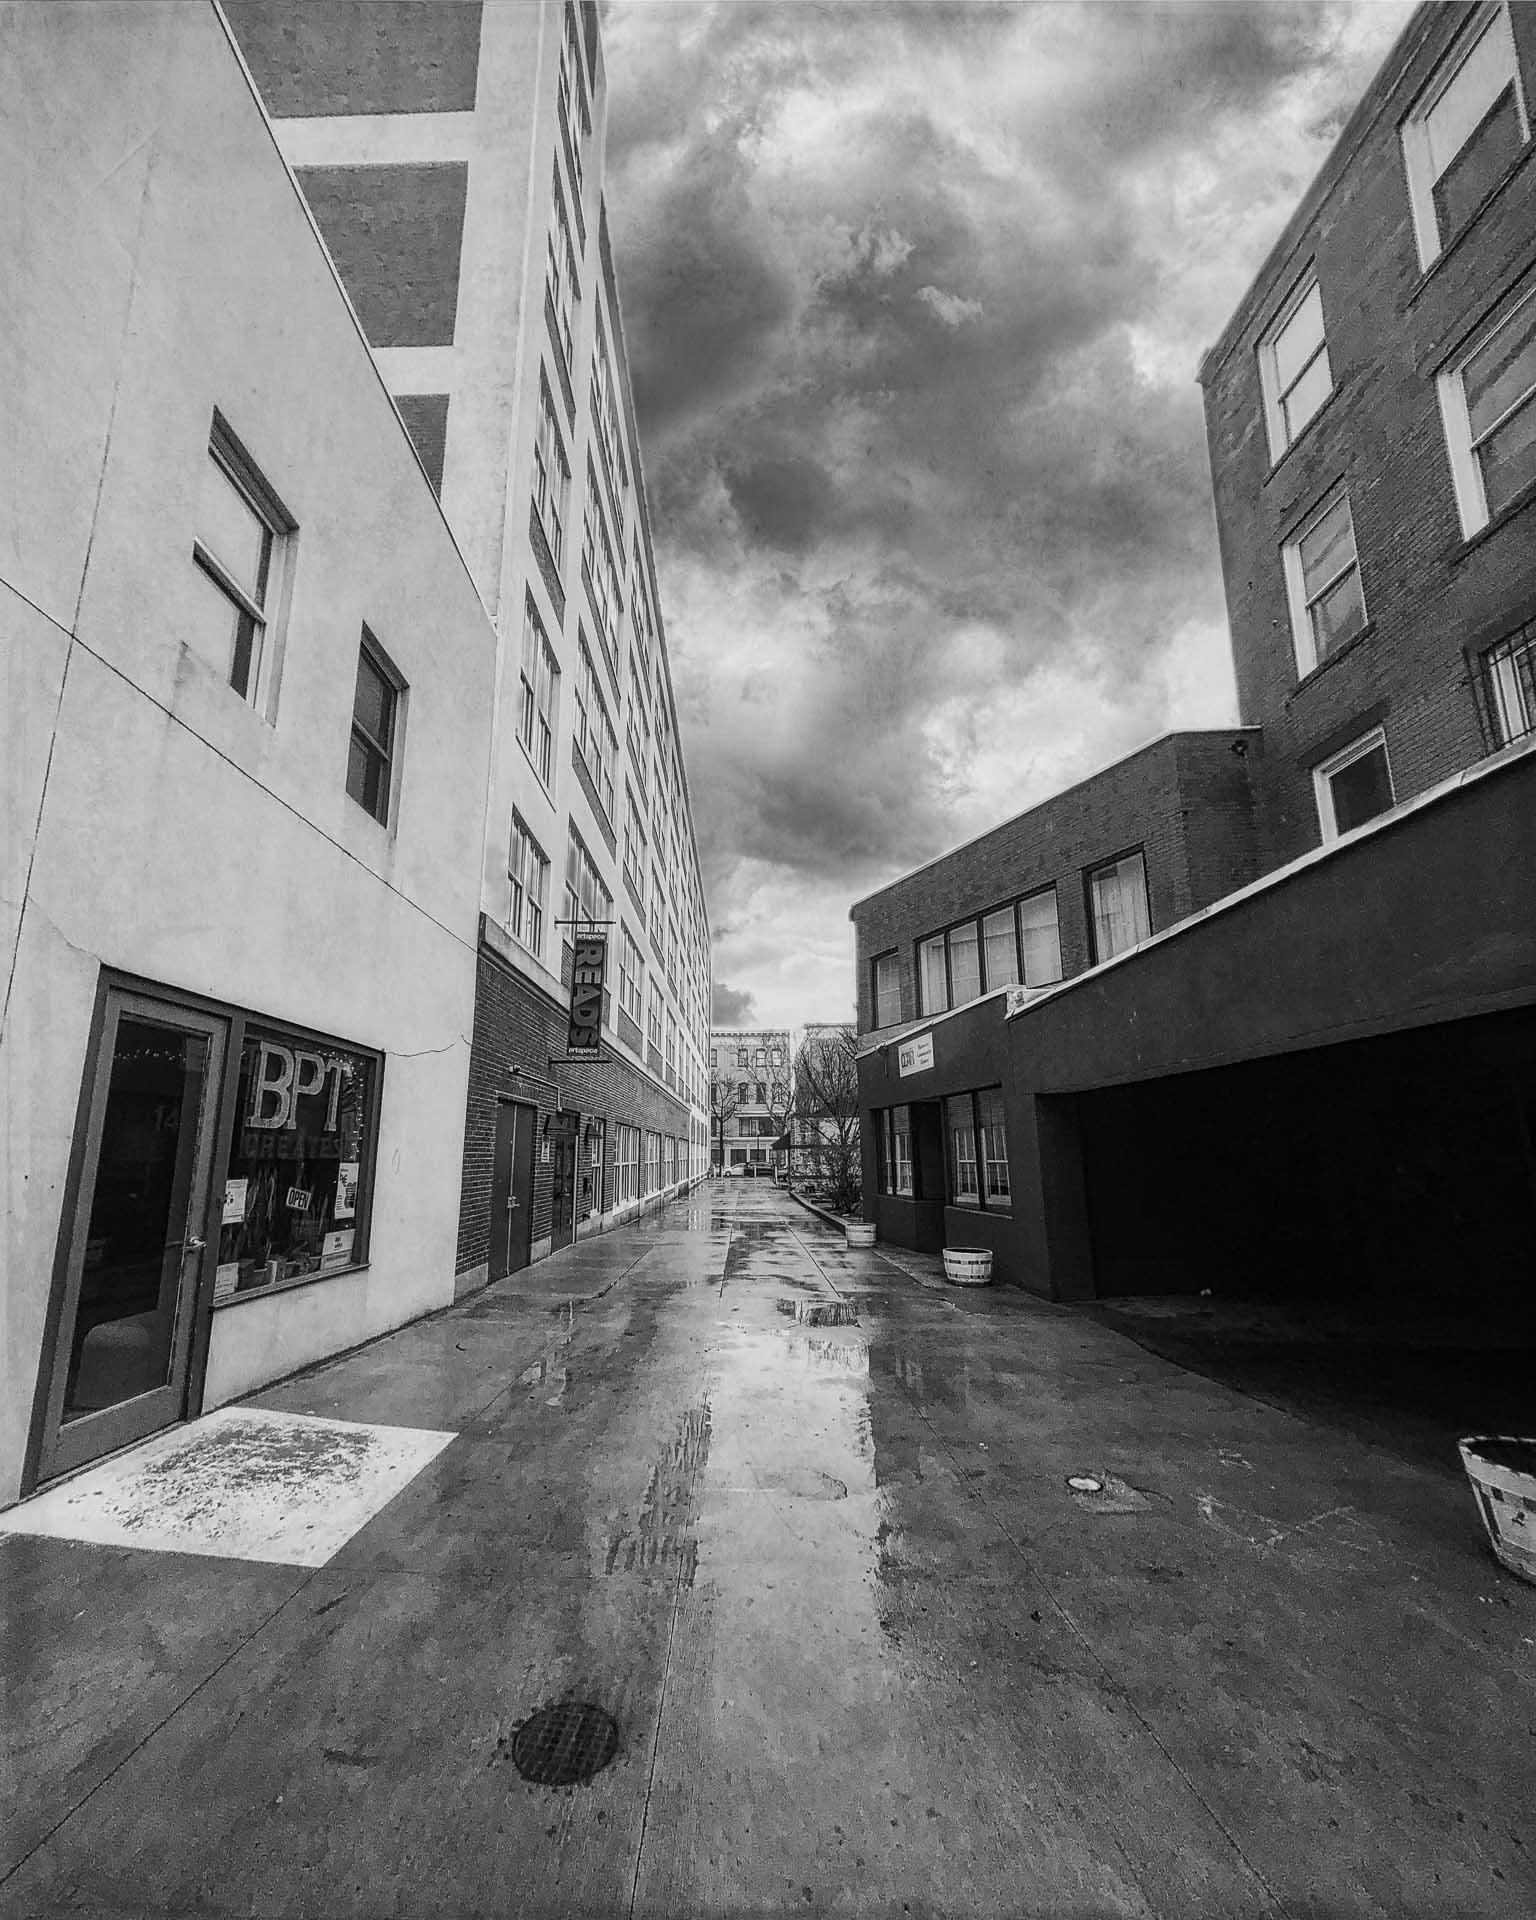 Stormy Alley Website   Instagra - photografia   ello